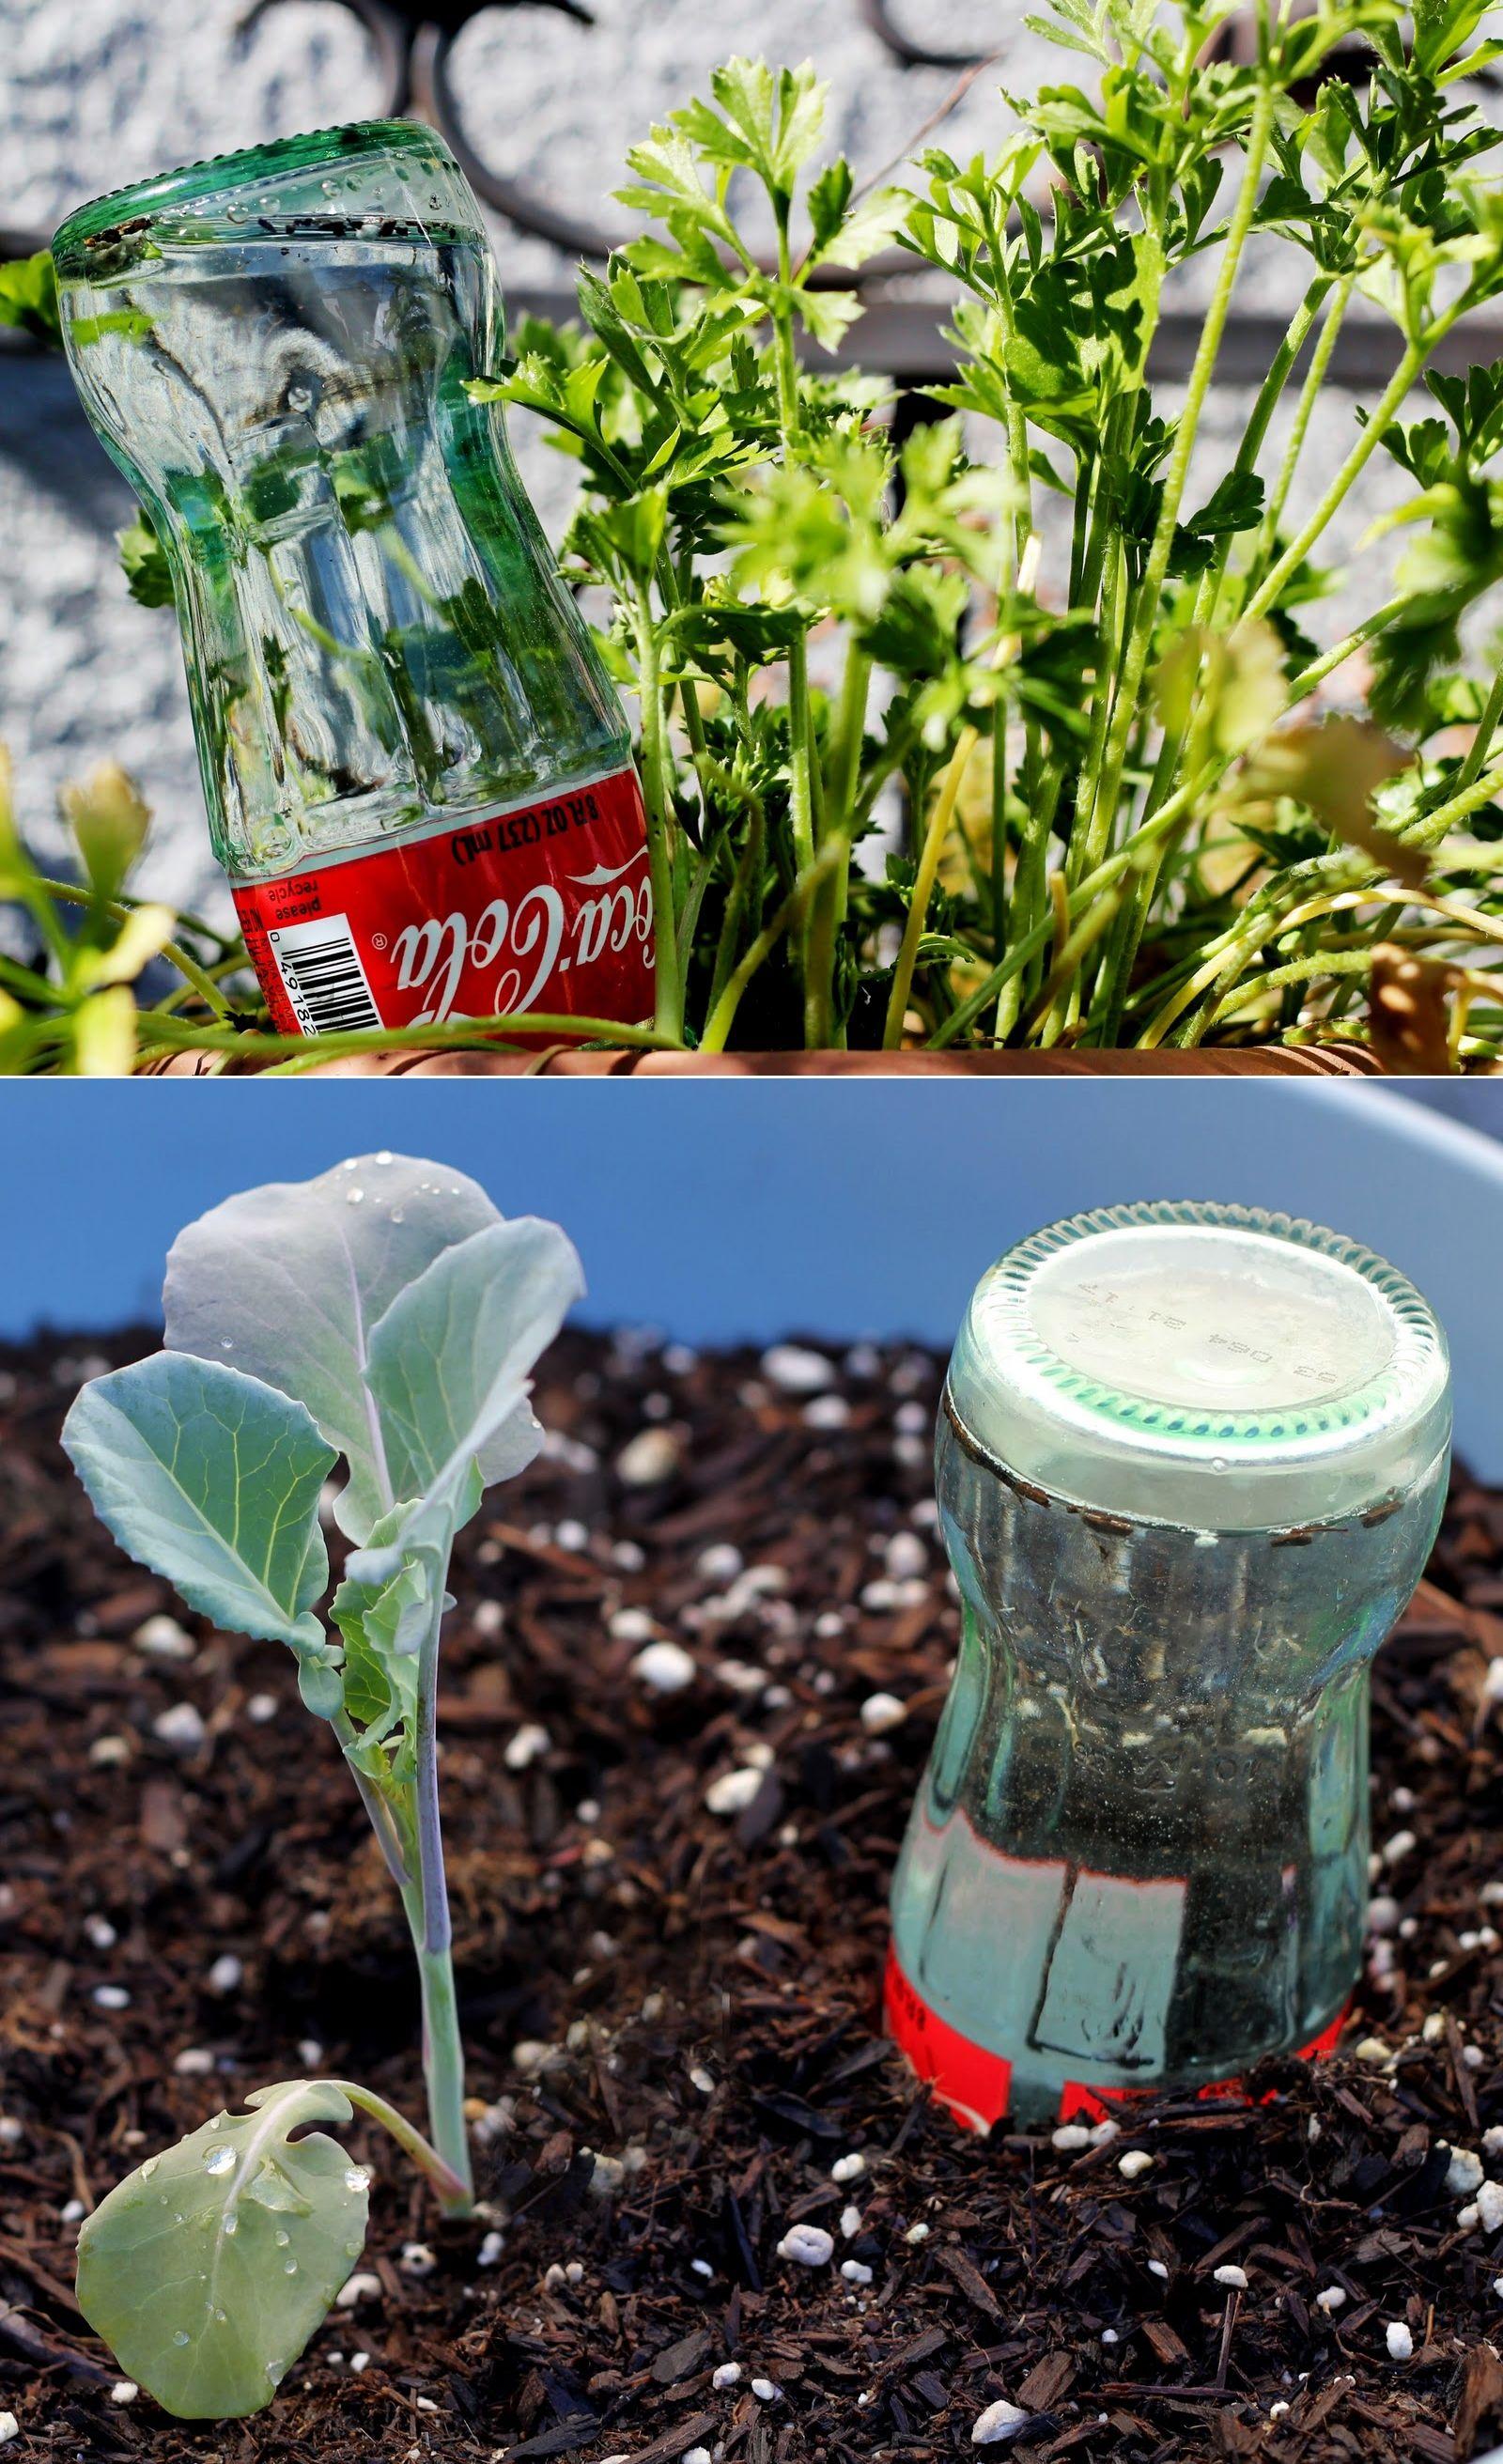 Garden decor with tyres  watering uglobesu  Garden and yard  Pinterest  Glass bottle